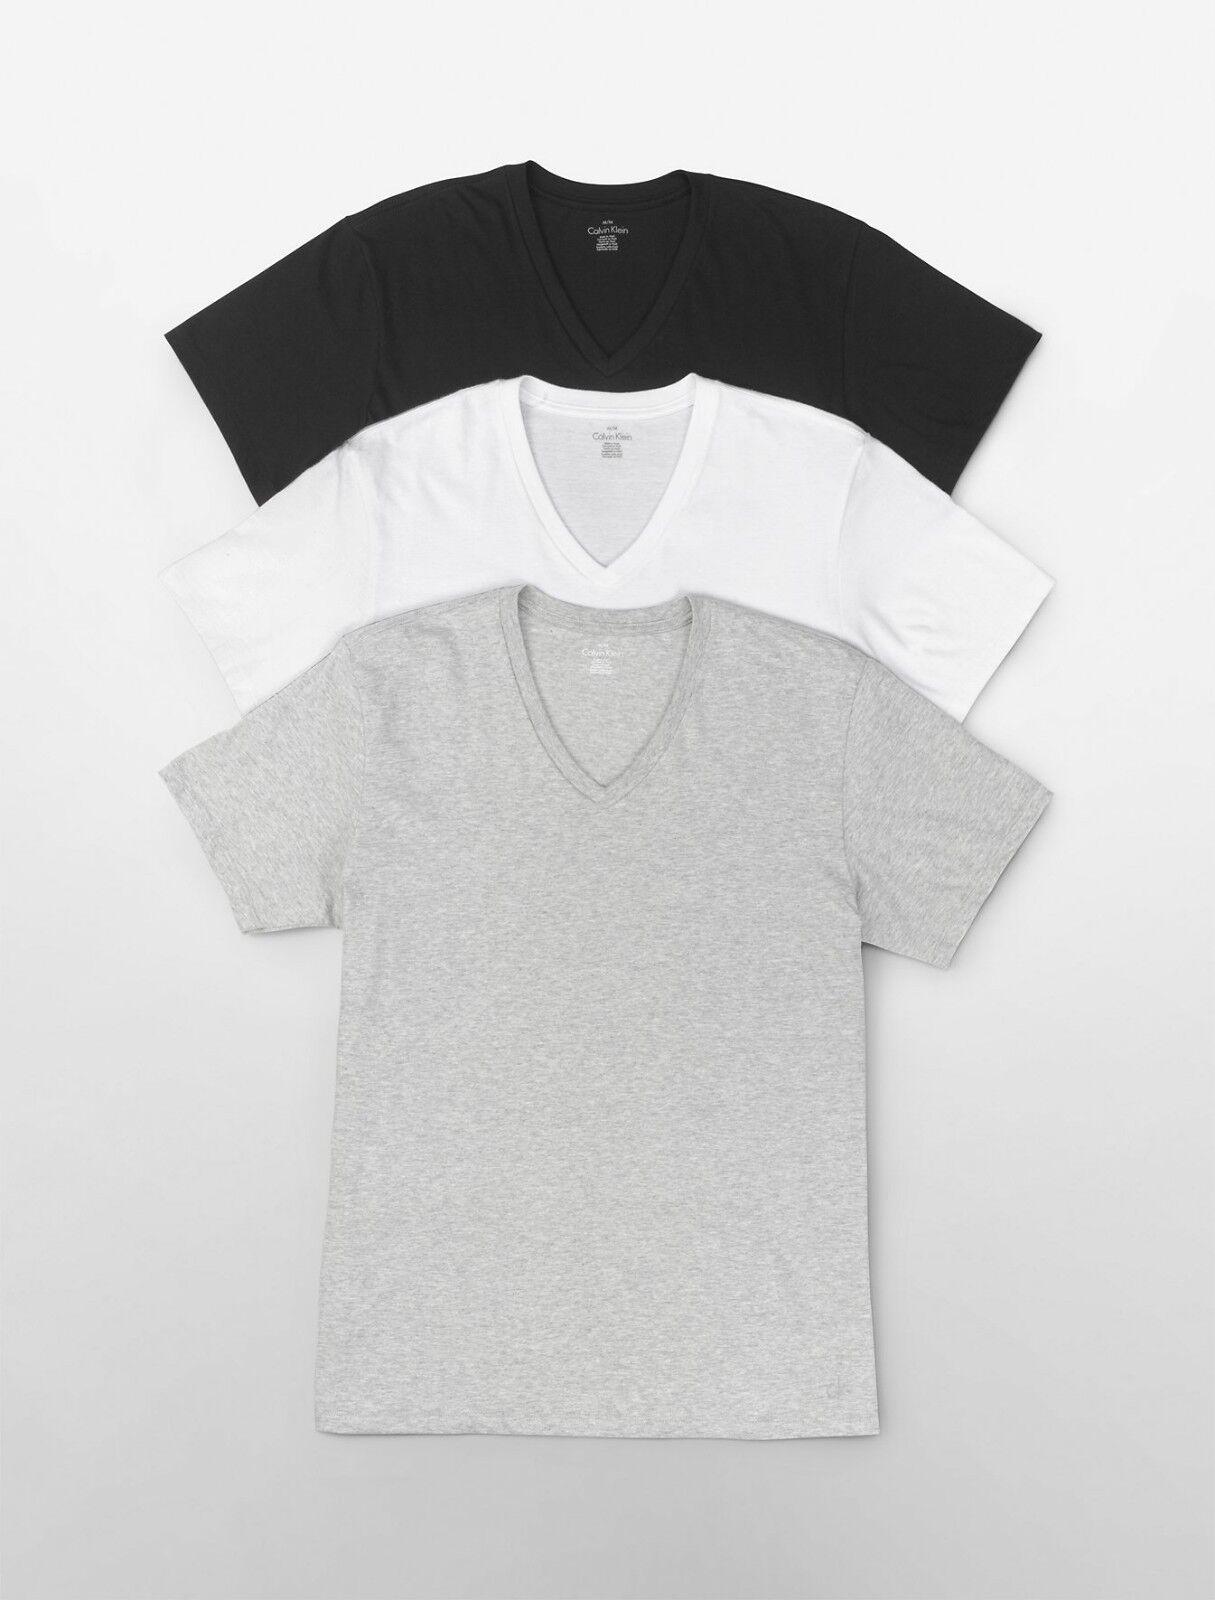 V-Neck-Black/White/Gray